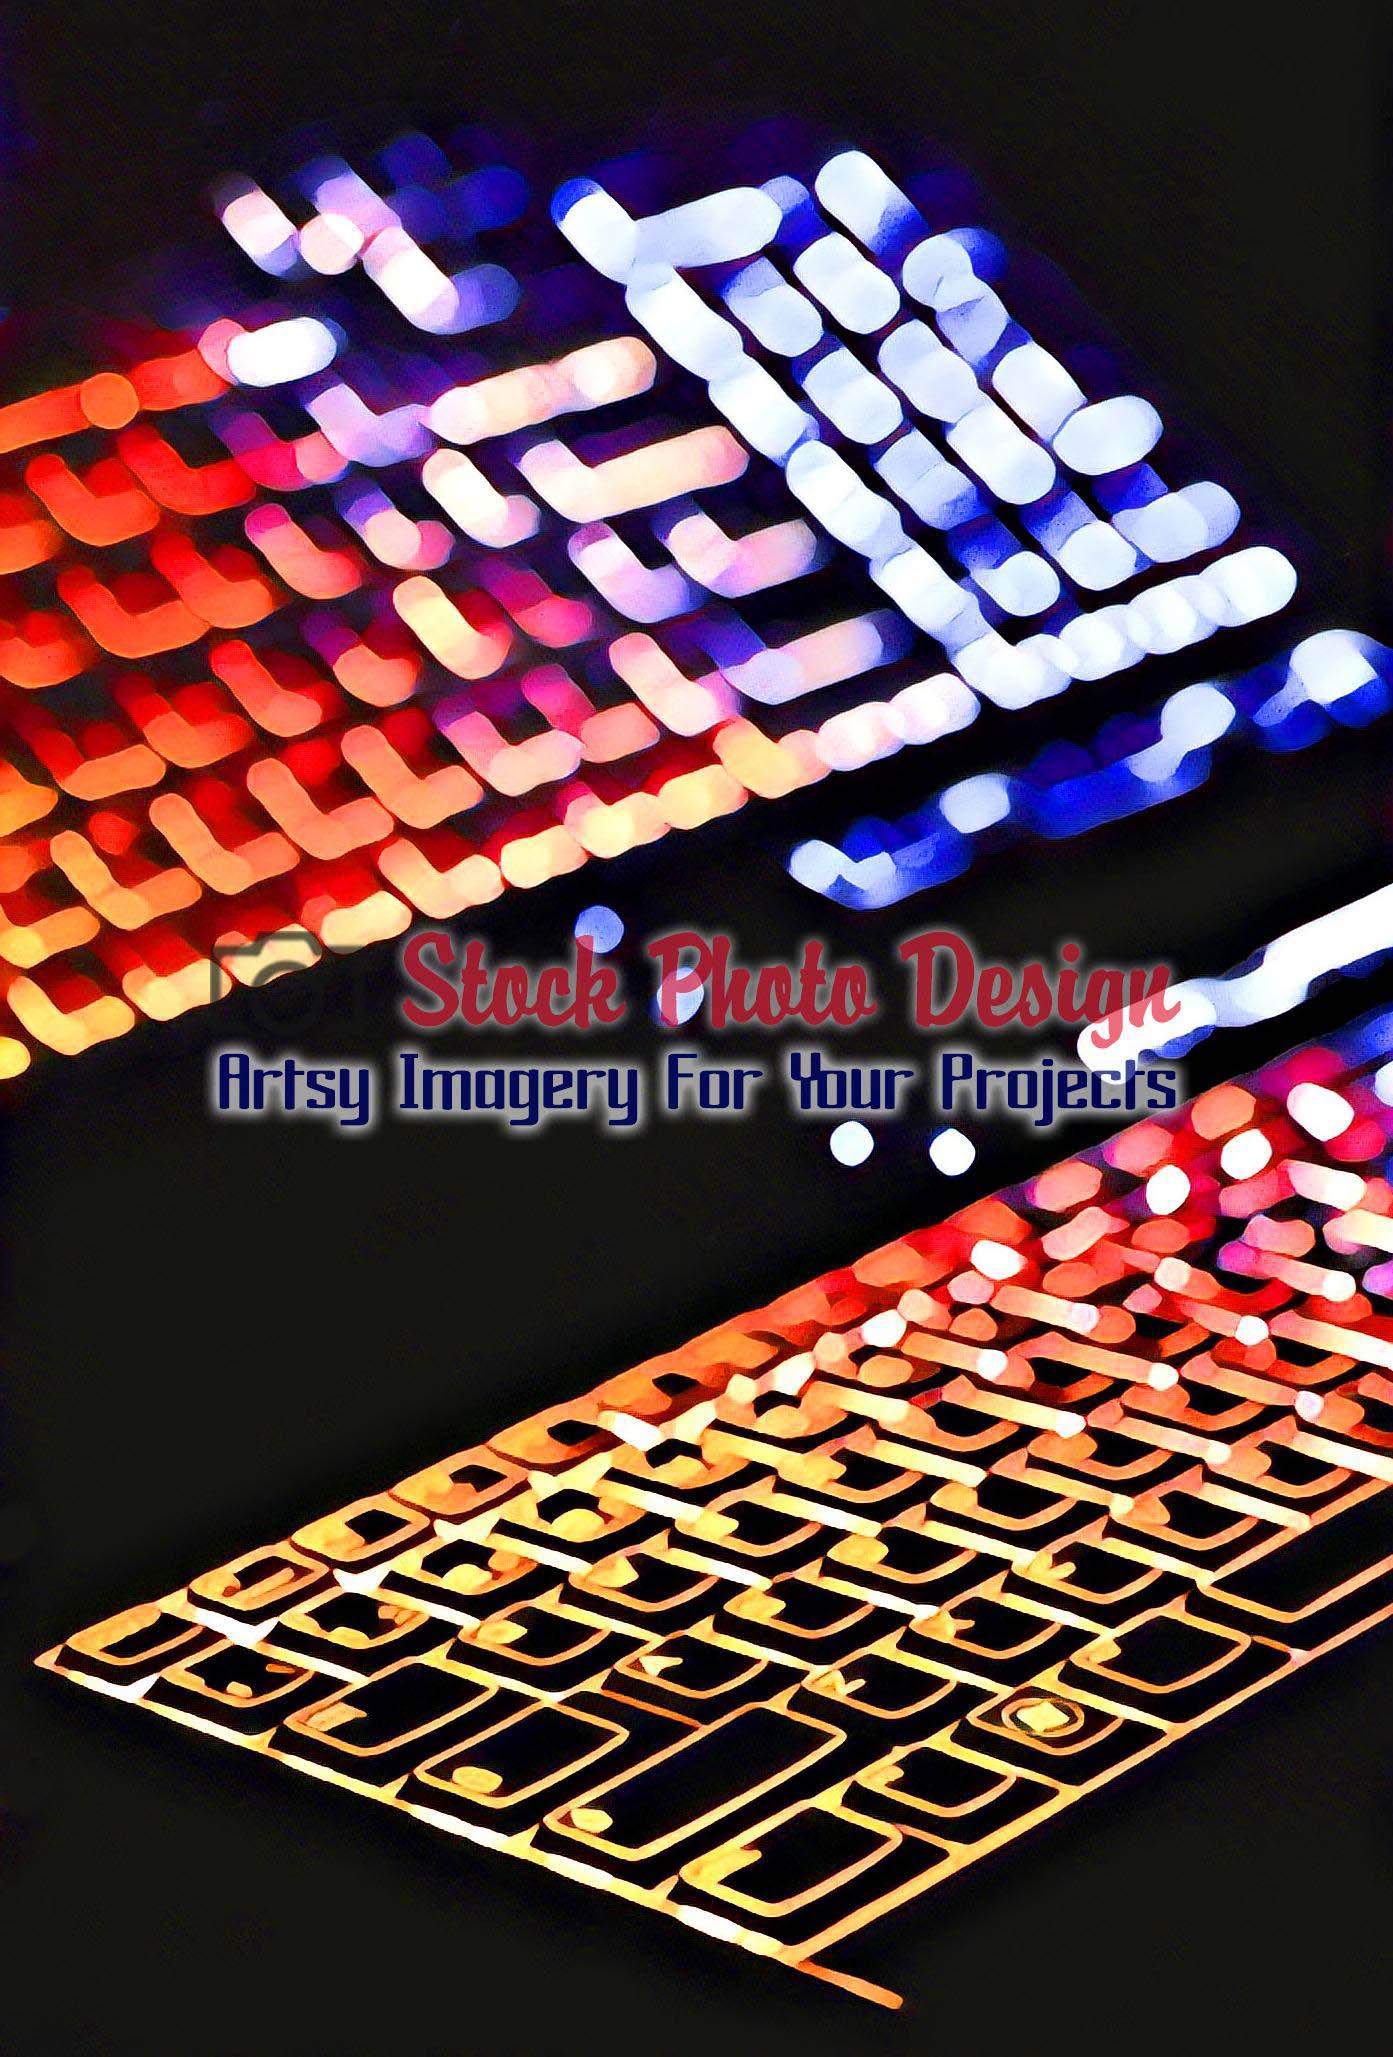 Colorful Illuminated Keyboard with Reflection